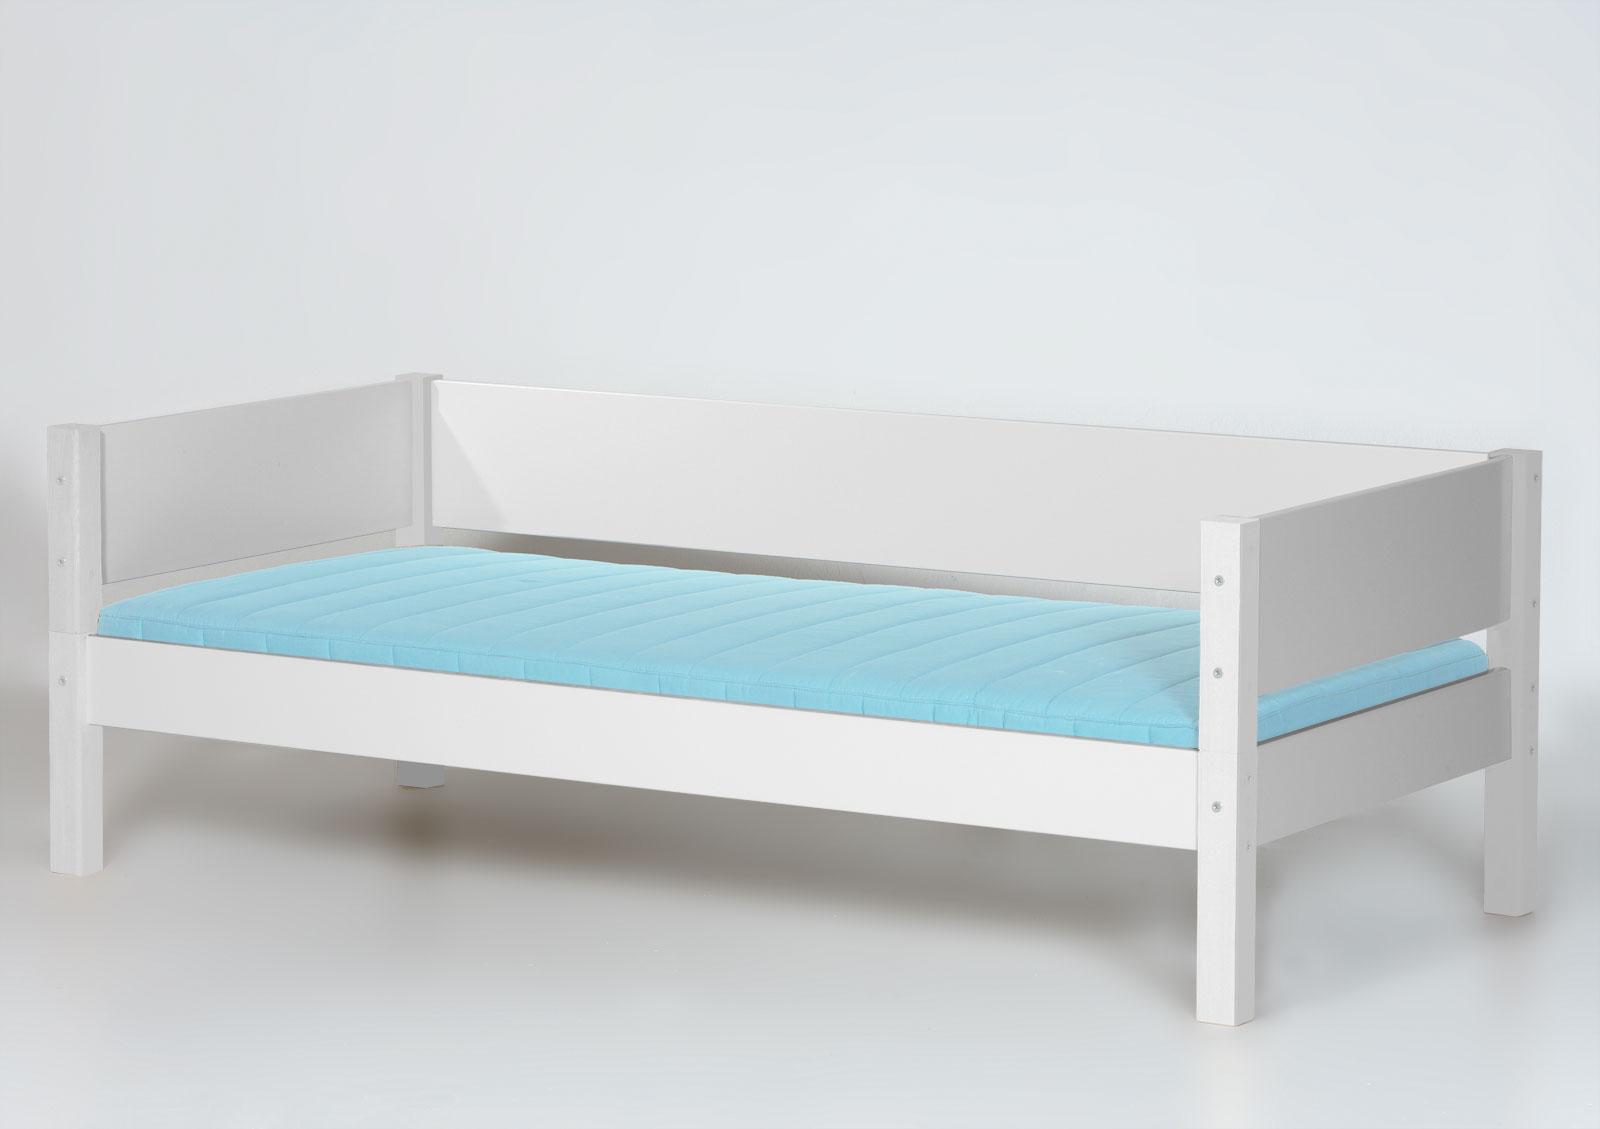 ziemlich kinder doppelbettrahmen fotos bilderrahmen ideen. Black Bedroom Furniture Sets. Home Design Ideas